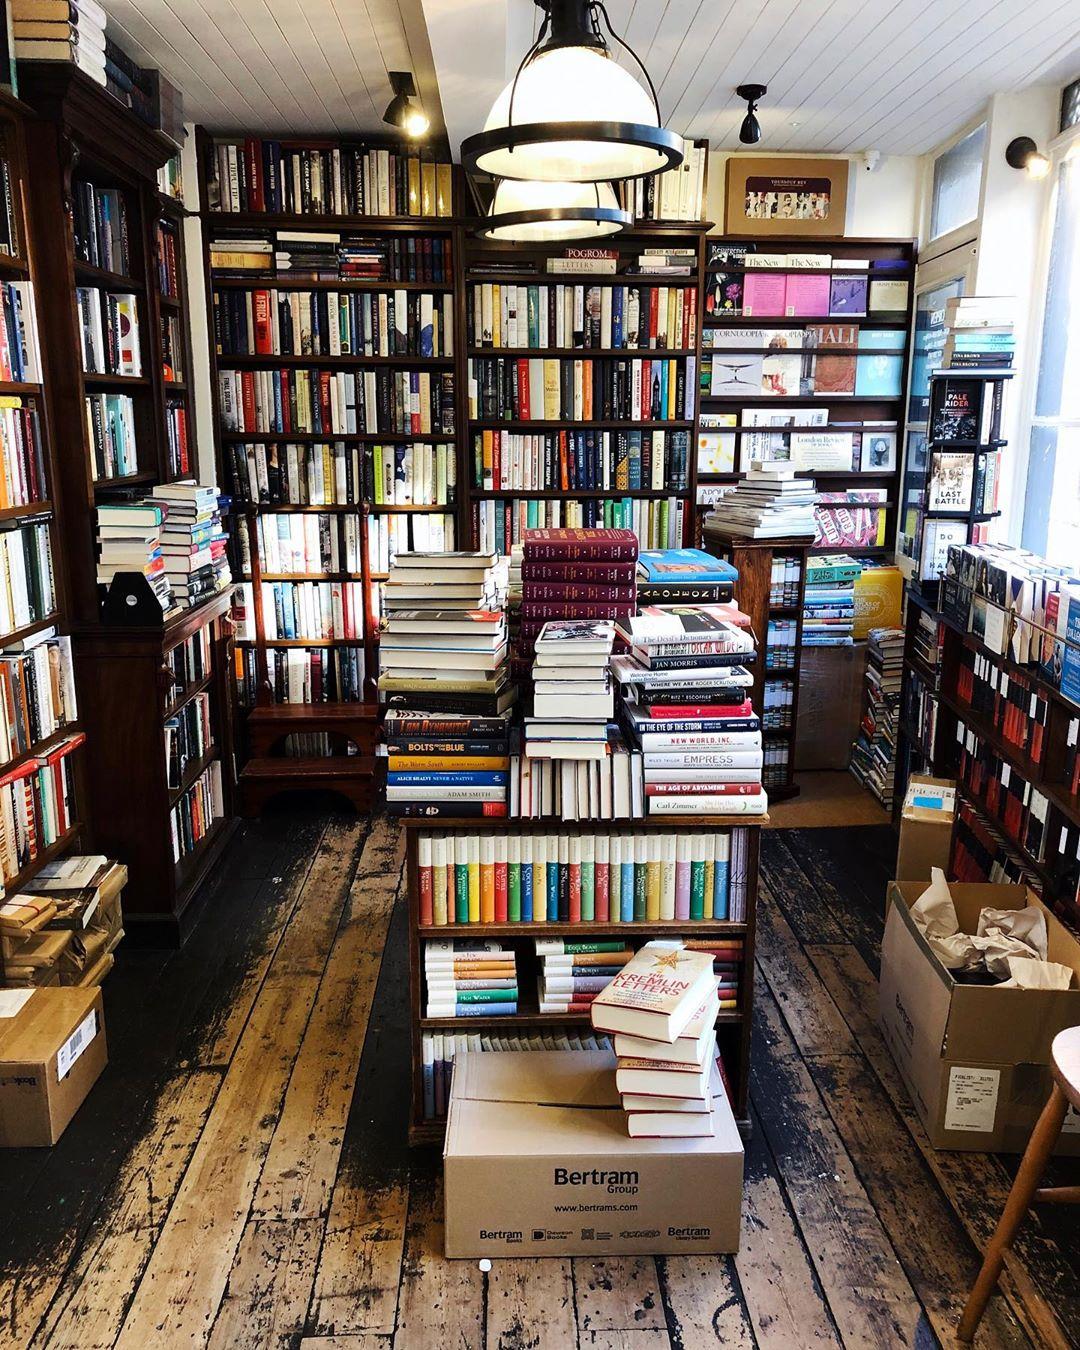 Above: John Sandoe Books